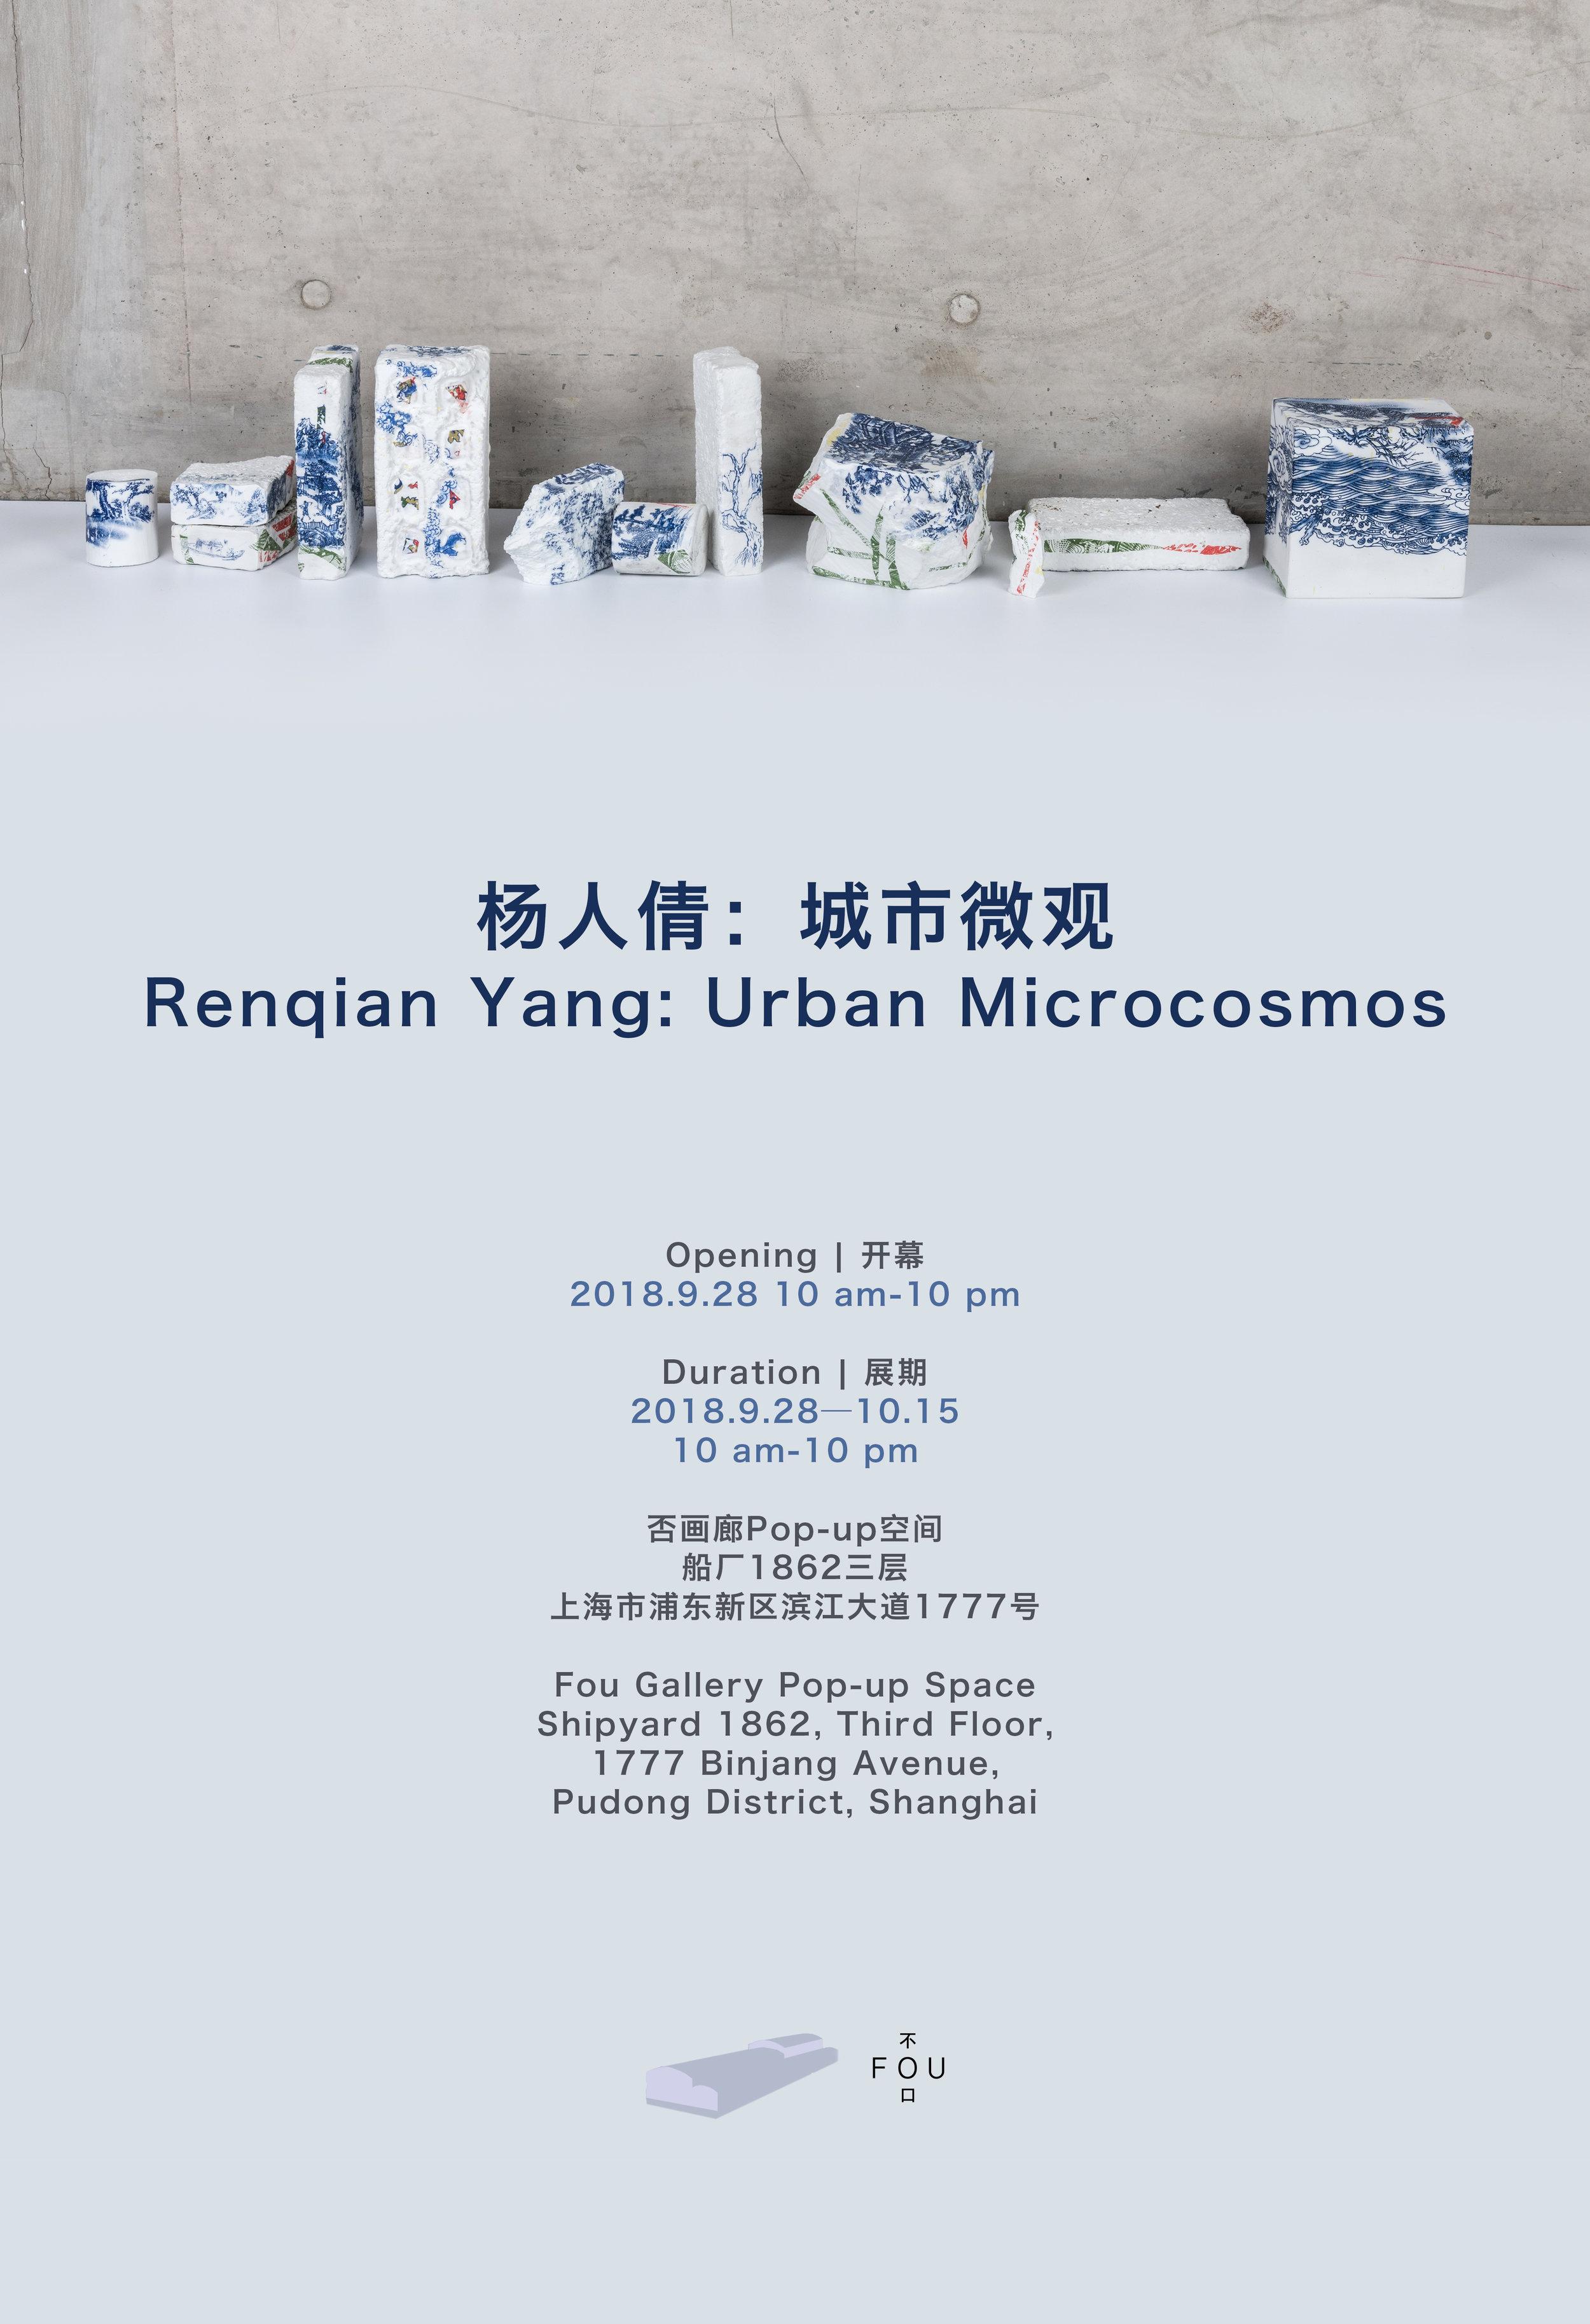 Renqian Yang: Urban Microcosmos Exhibition Time:  September 28–October 15, 2018  Location:  Shipyard 1862, 1777 Binjiang Avenue, Pudong District, Shanghai.